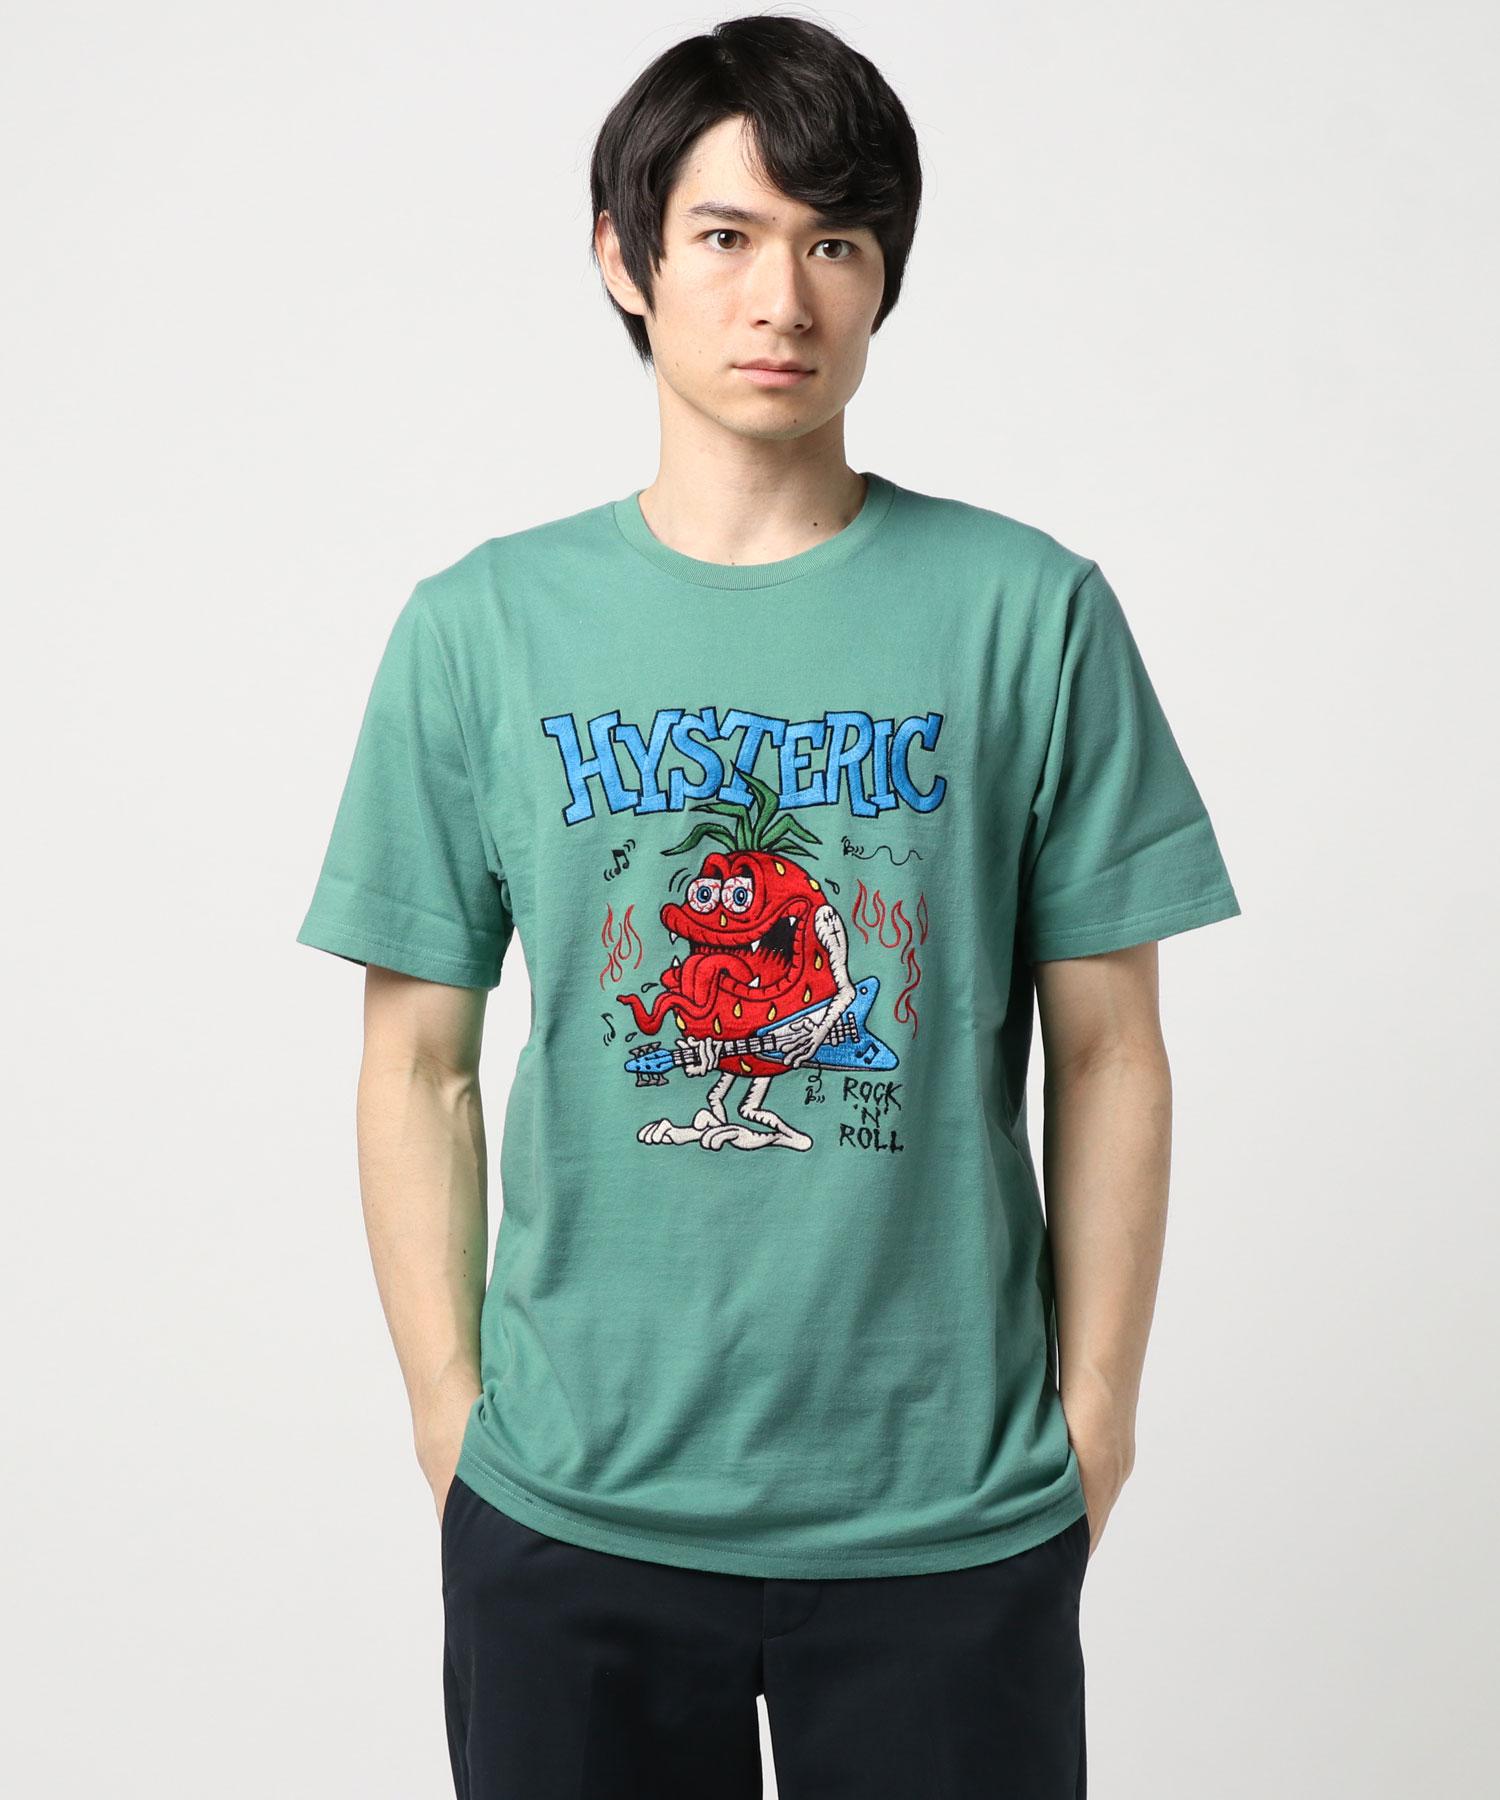 STBFV刺繍 Tシャツ